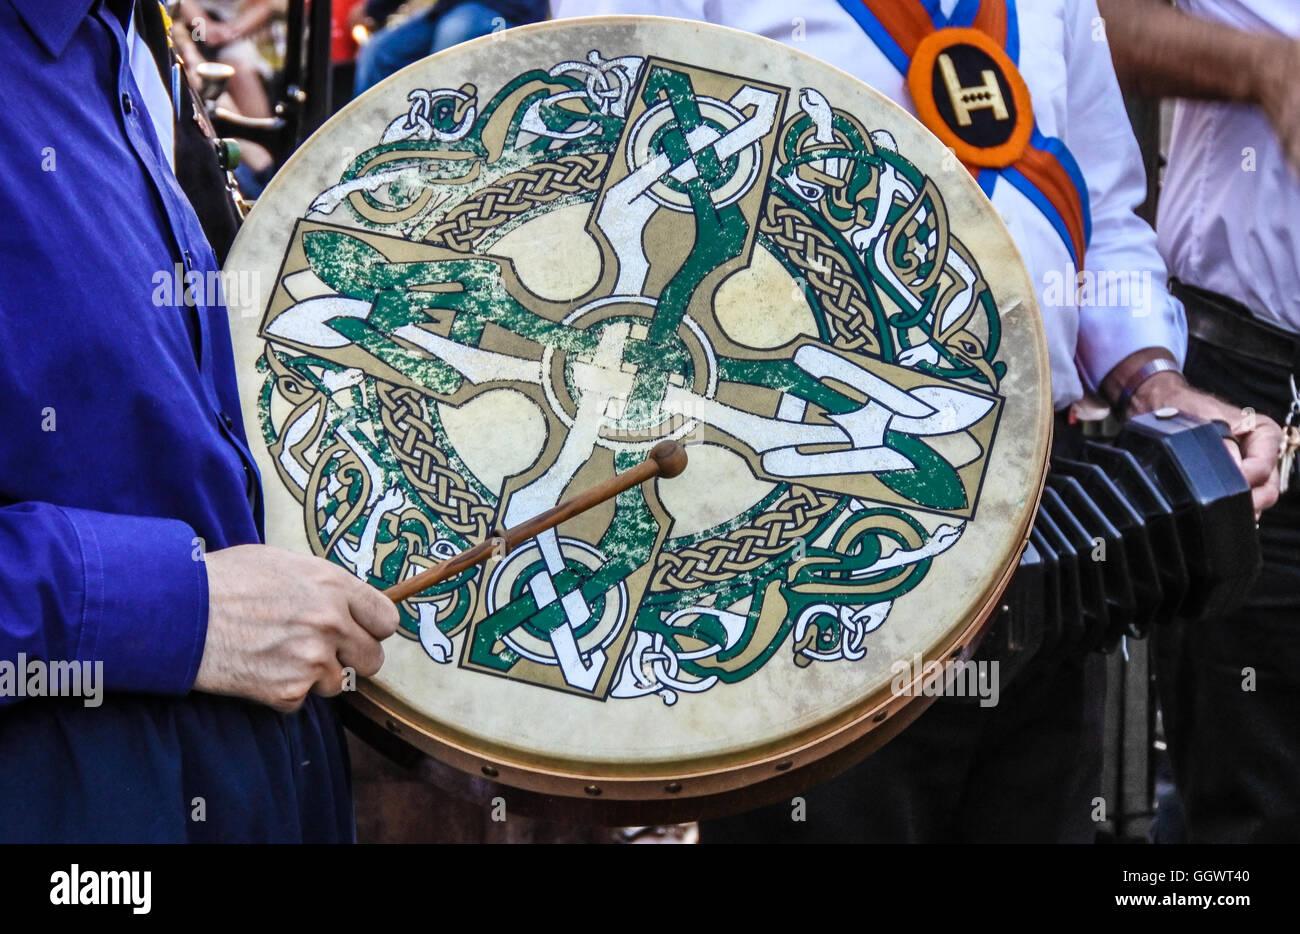 Celtic design on drum (bodhran) used by Morris dancer - Berkhamsted, UK - Stock Image